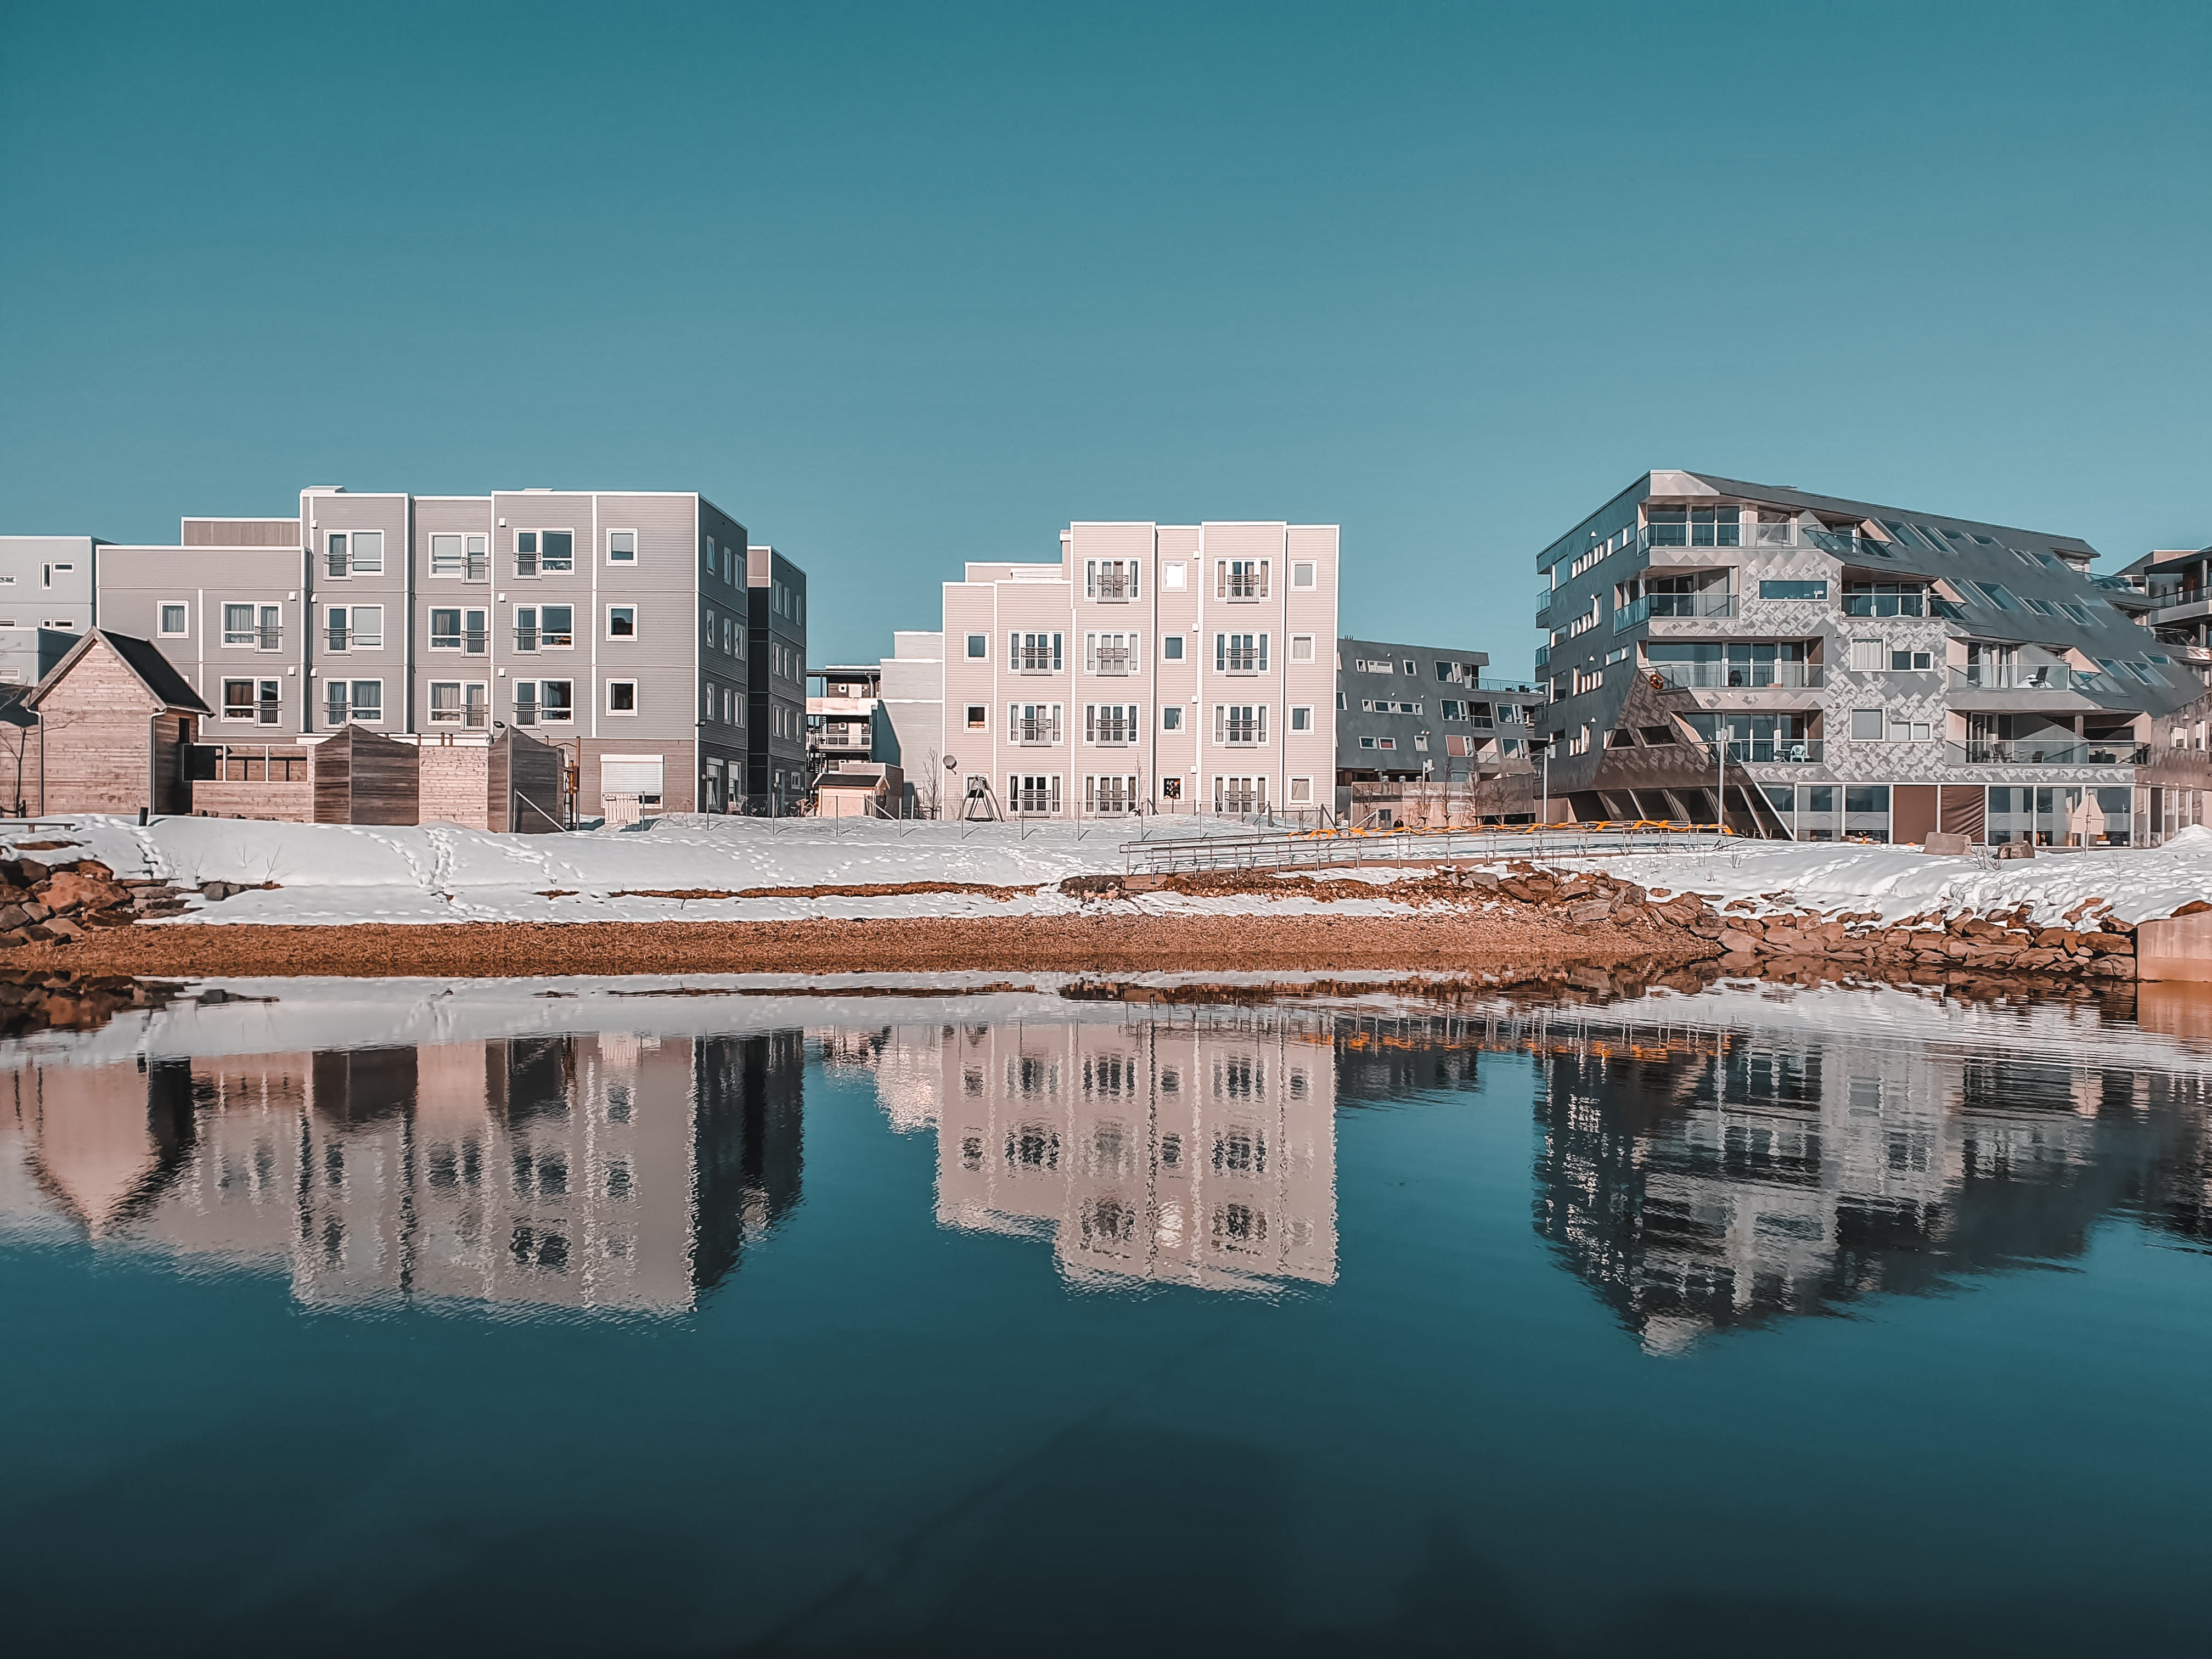 Photos gratuites de architecture, bâtiments, citadin, panorama urbain